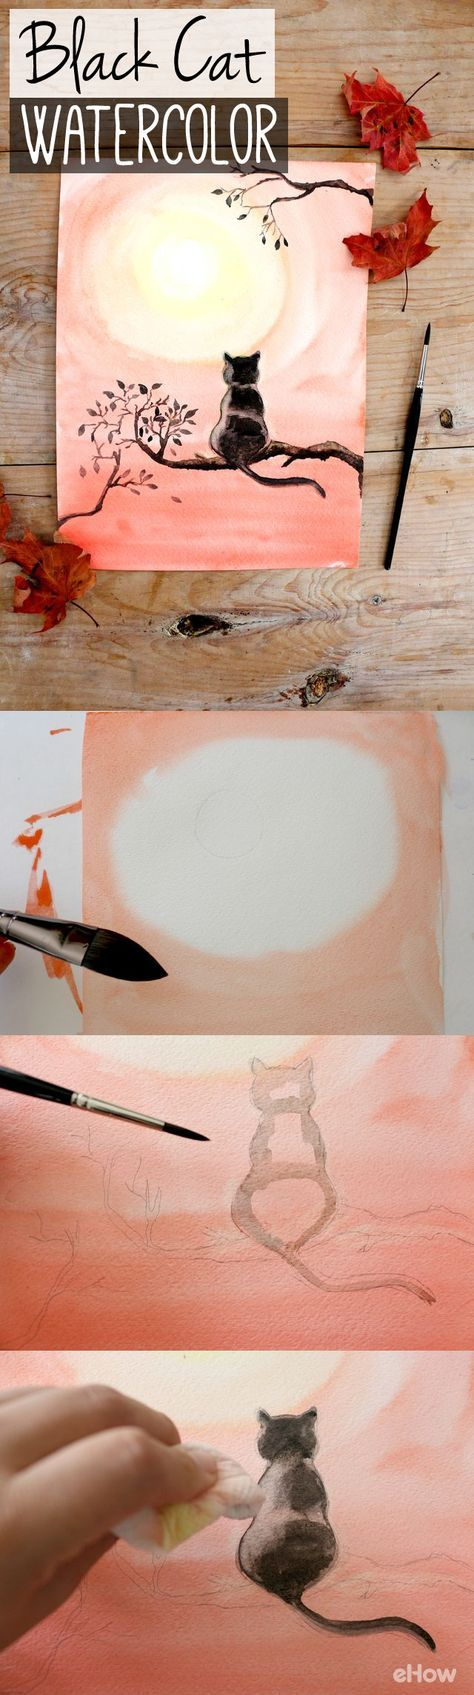 Watercolor artist magazine subscription - Diy Black Cat Watercolor Painting